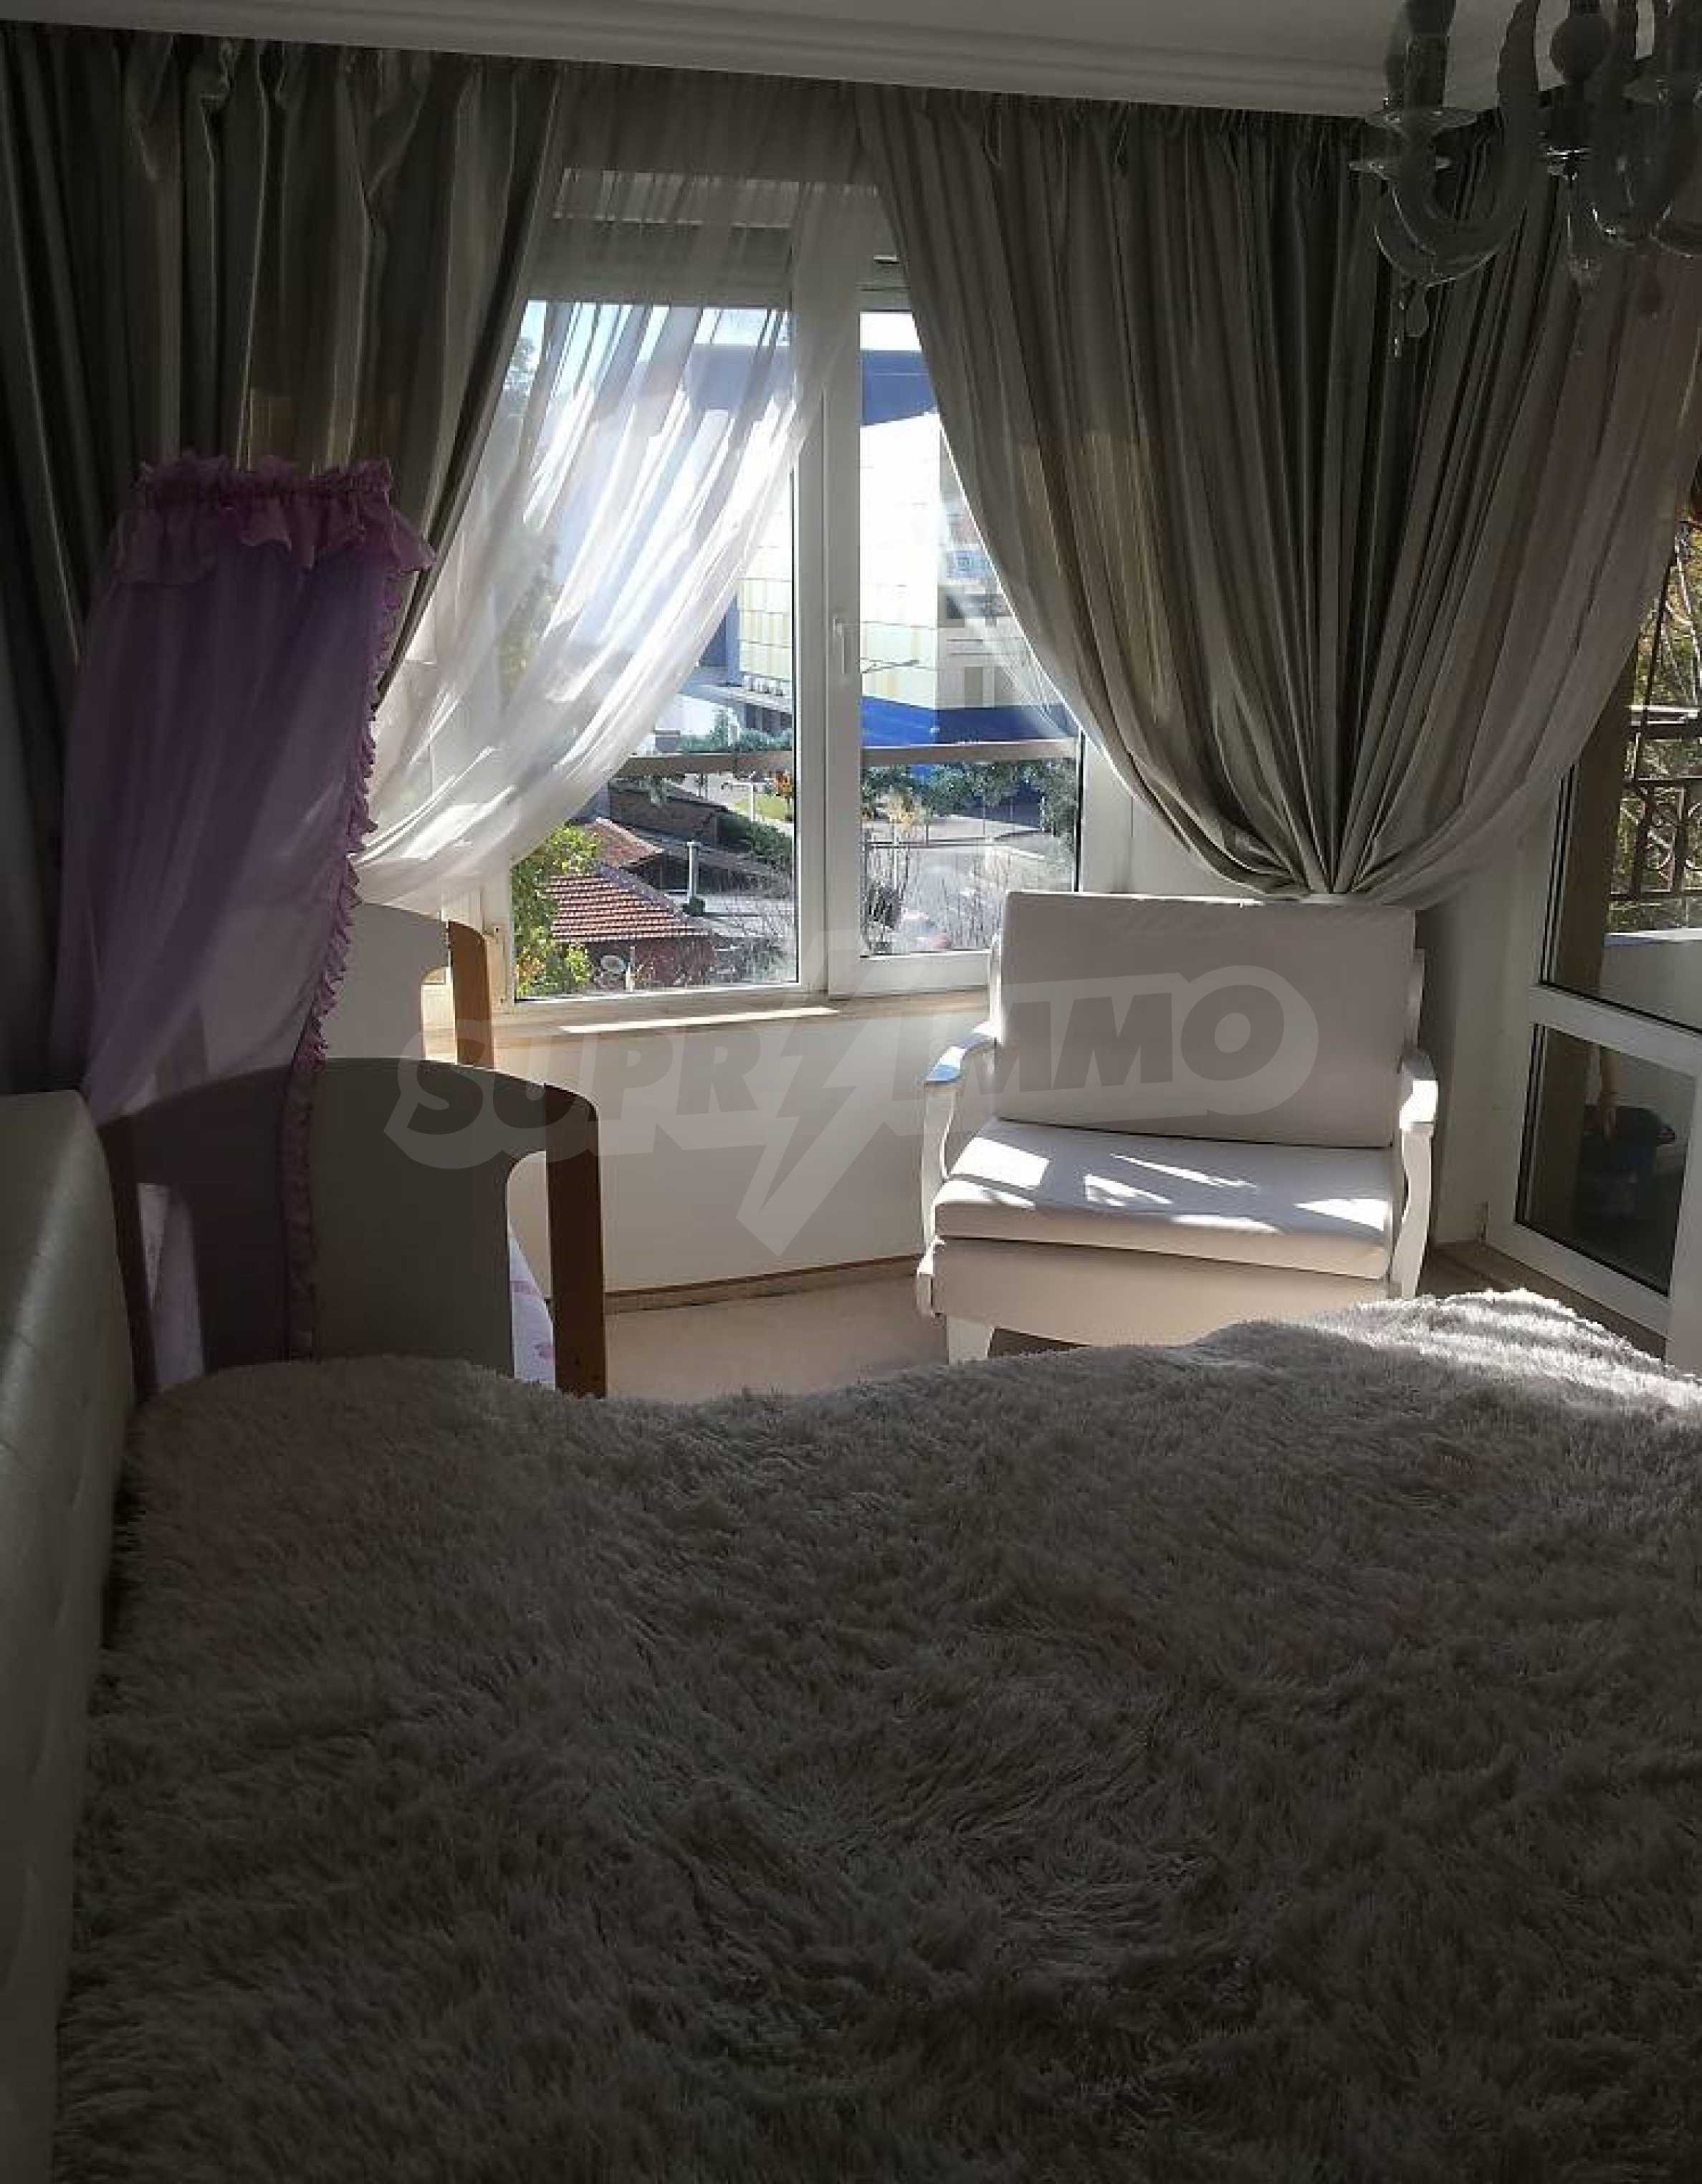 1-bedroom apartment in Burgas 6